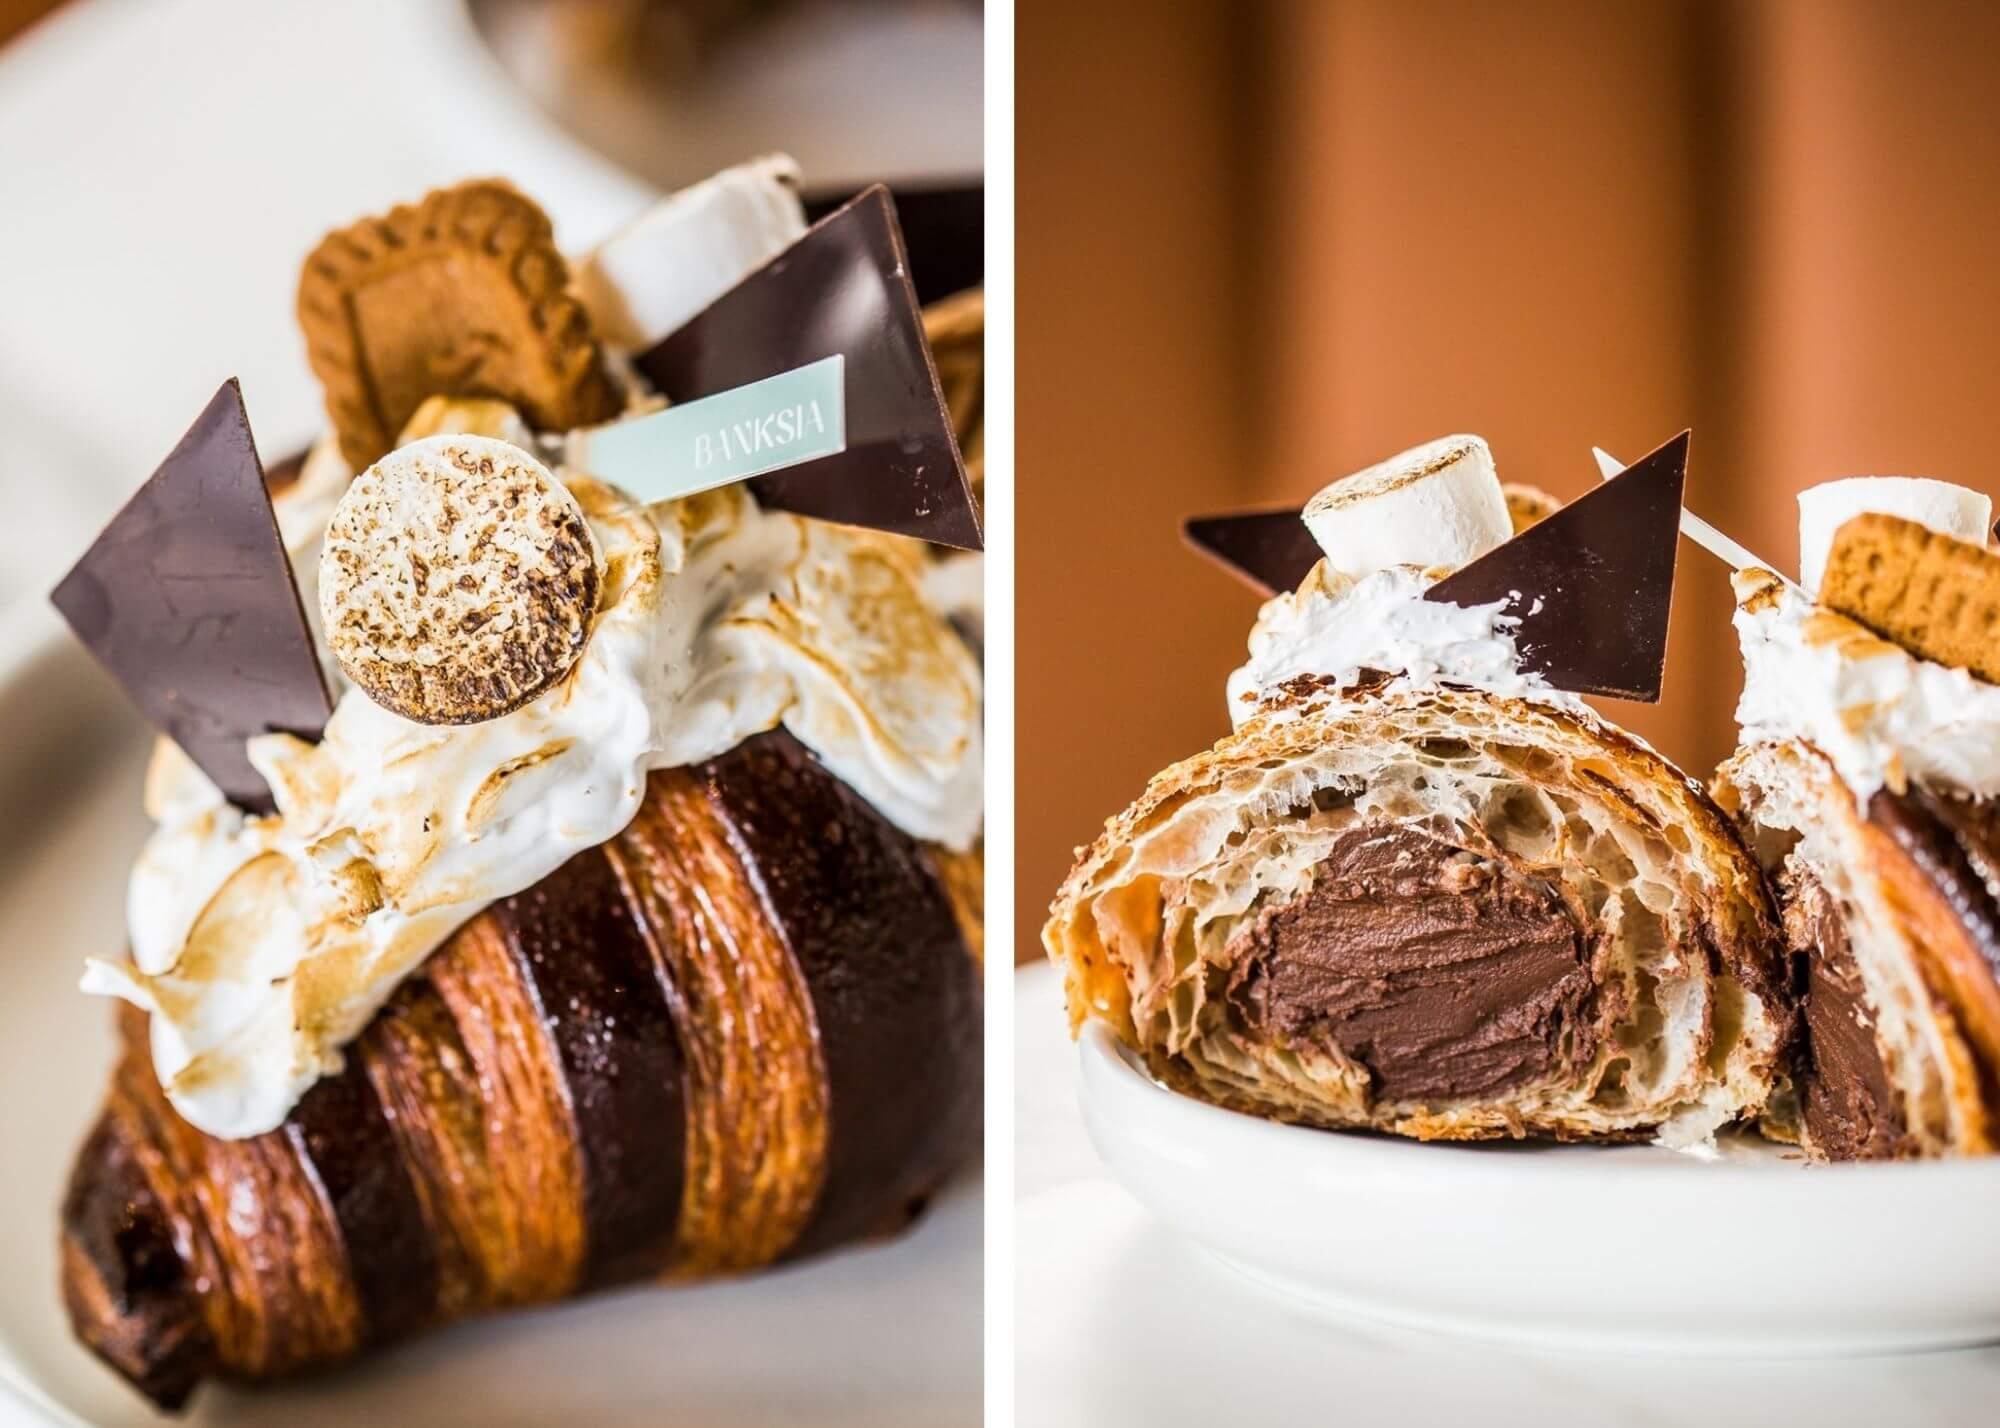 The Banskia Bakehouse S'mores croissant